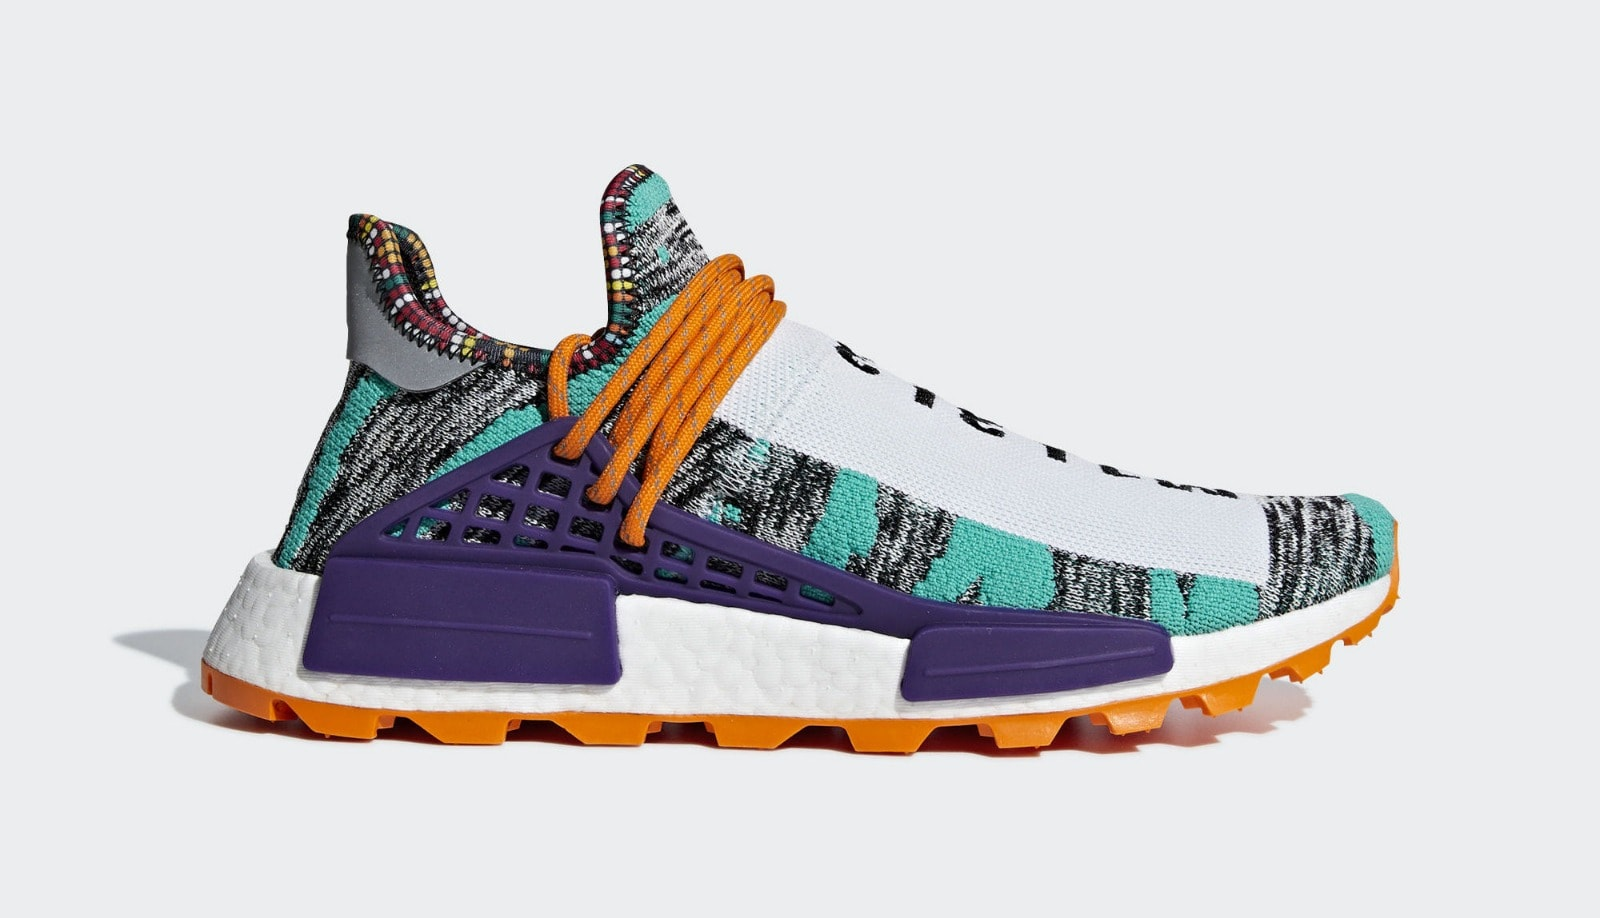 722de54c6 Pharrell Williams x adidas Afro Hu NMD Official Look - JustFreshKicks